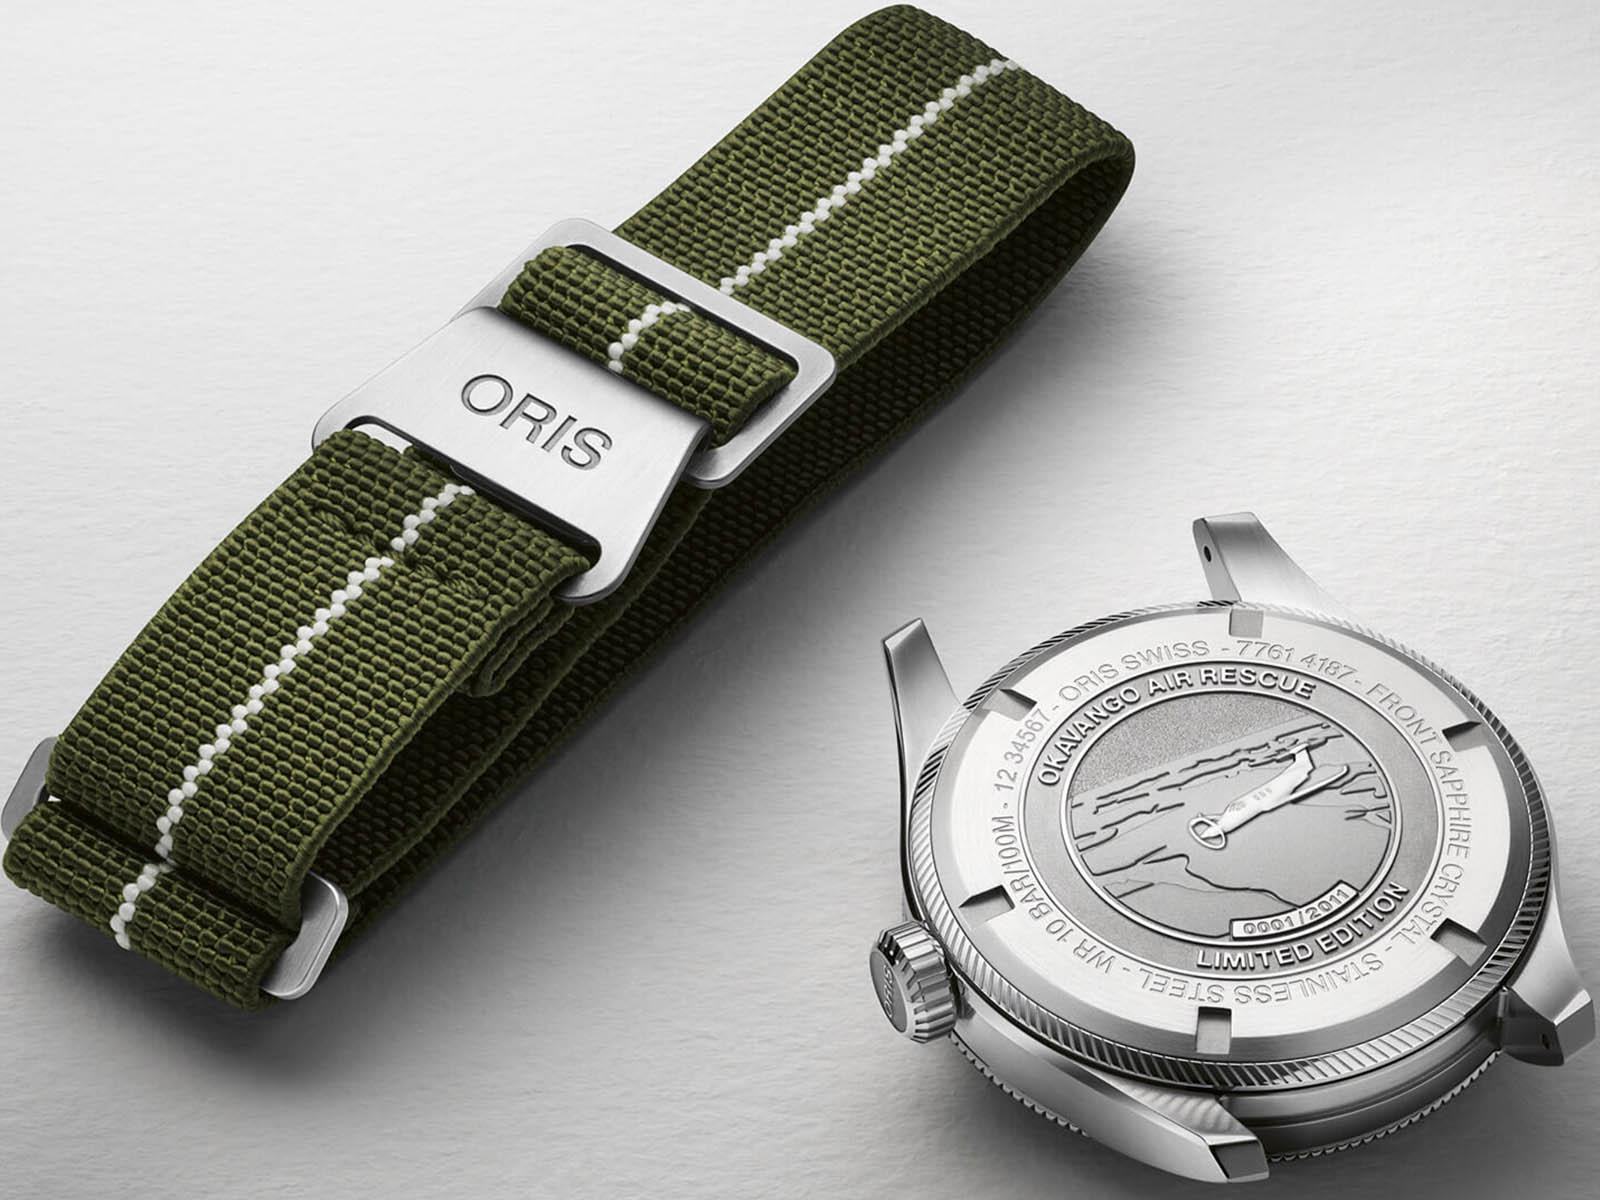 01-751-7761-4187-set-oris-big-crown-propilot-okavango-air-rescue-limited-edition-8.jpg